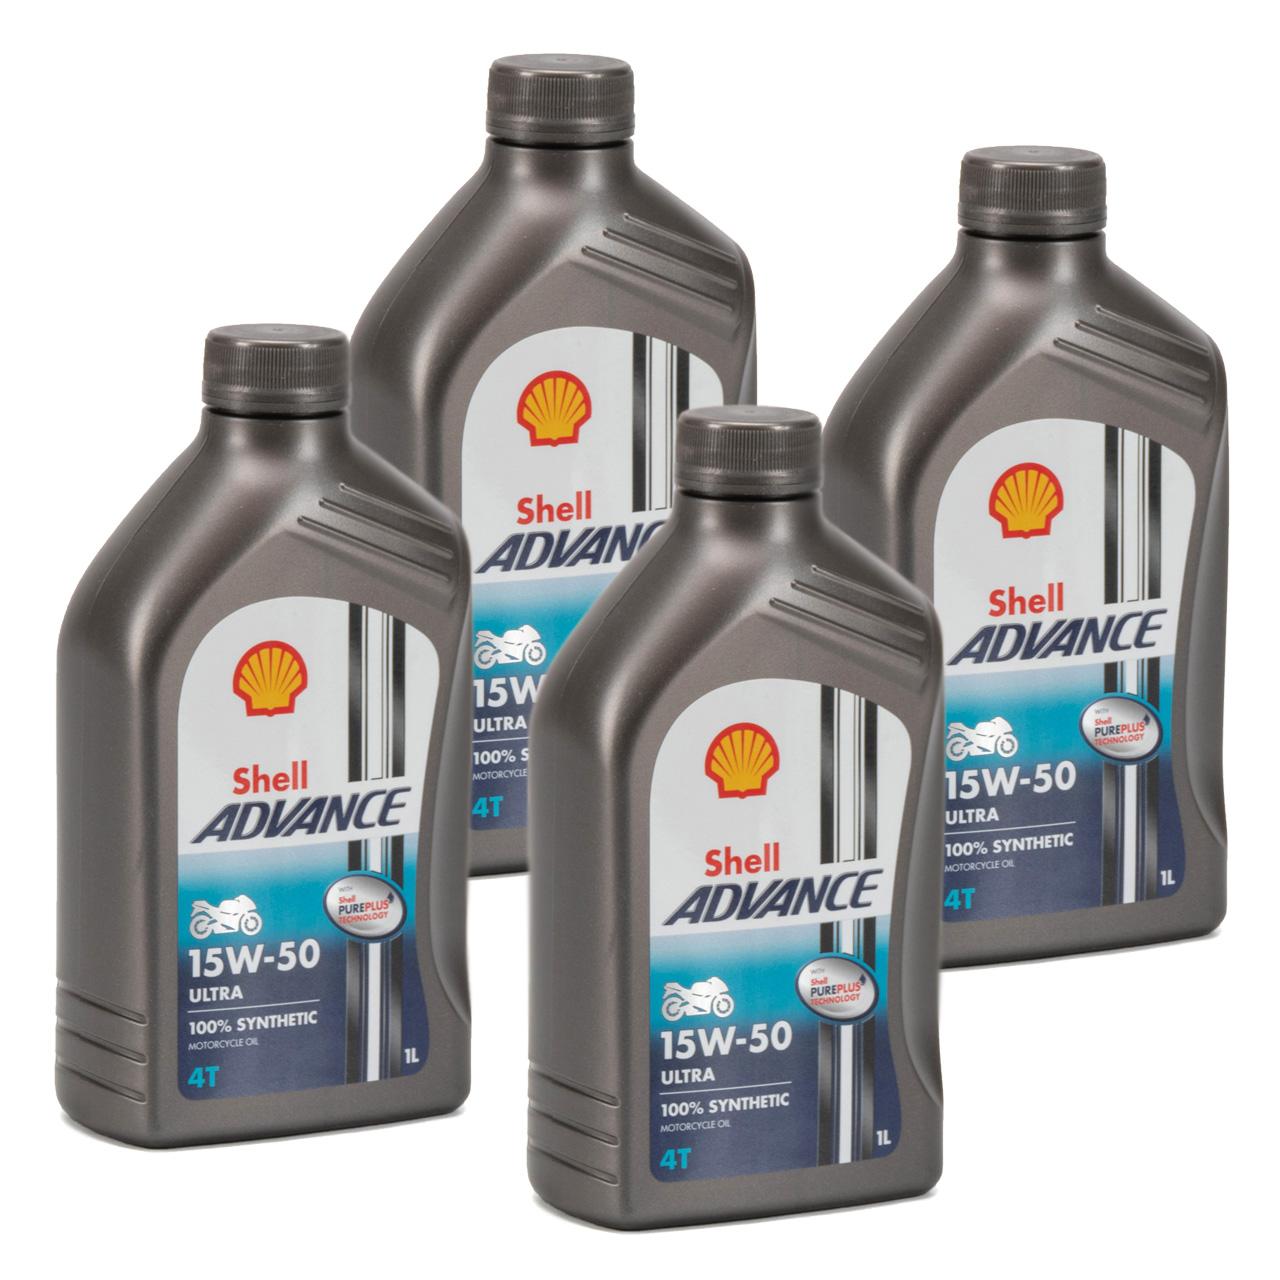 SHELL Motoröl Öl ADVANCE ULTRA 4T 4-TAKT 15W-50 API SN JASO MA-2 - 4L 4 Liter